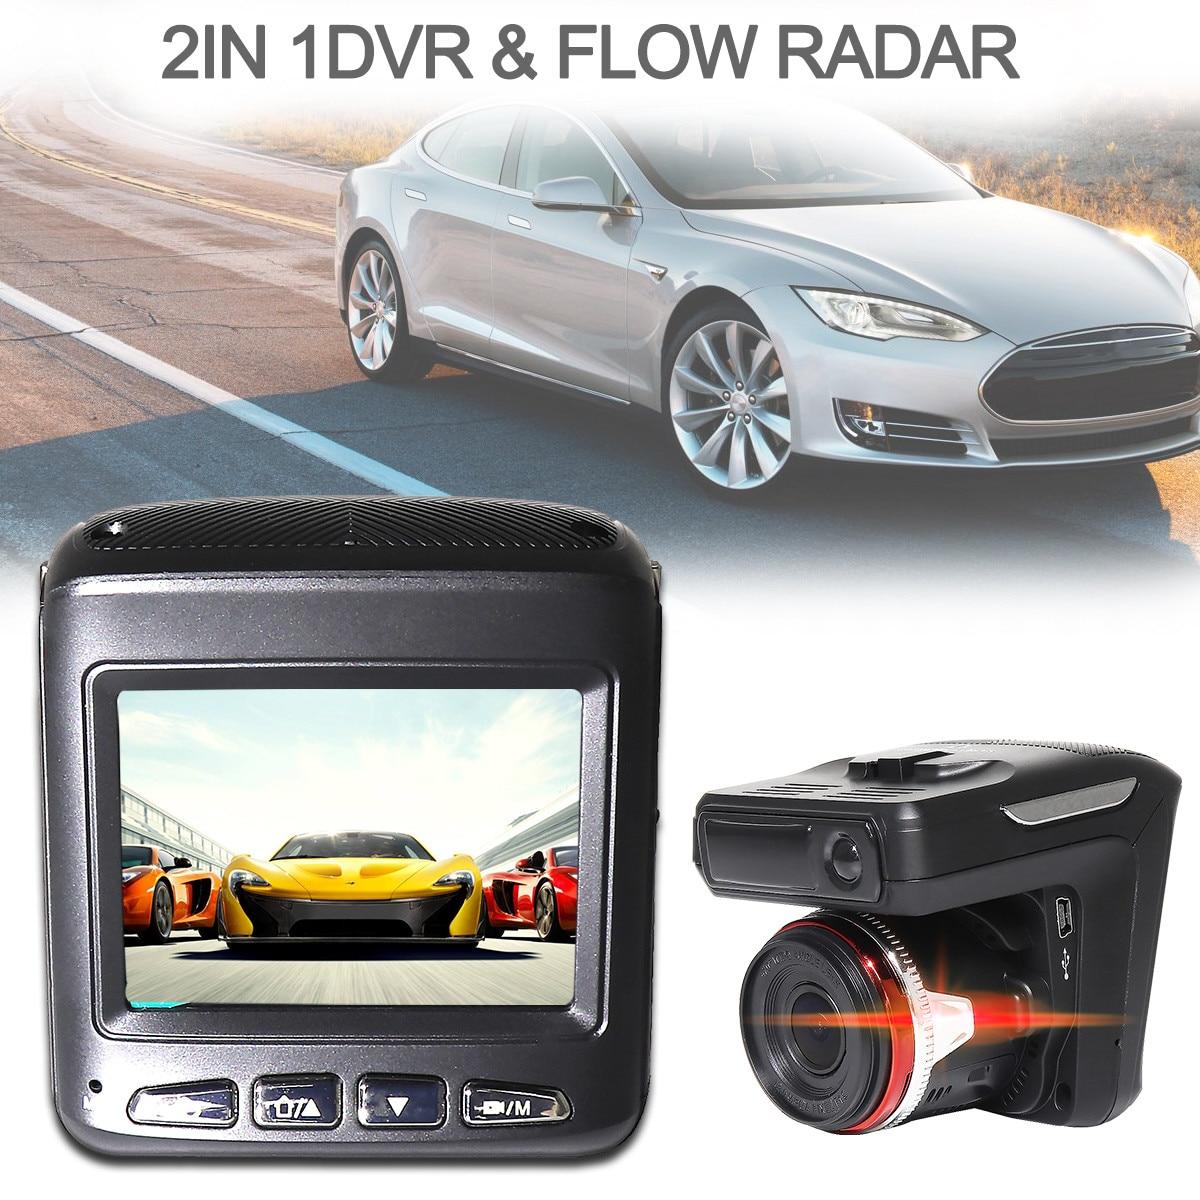 2 In 1 Car Radar Detector GPS HD 1280P Speedcam Anti Radar Detectors Car DVR Camera Dash Cam with Motion Detection Night Vision цена